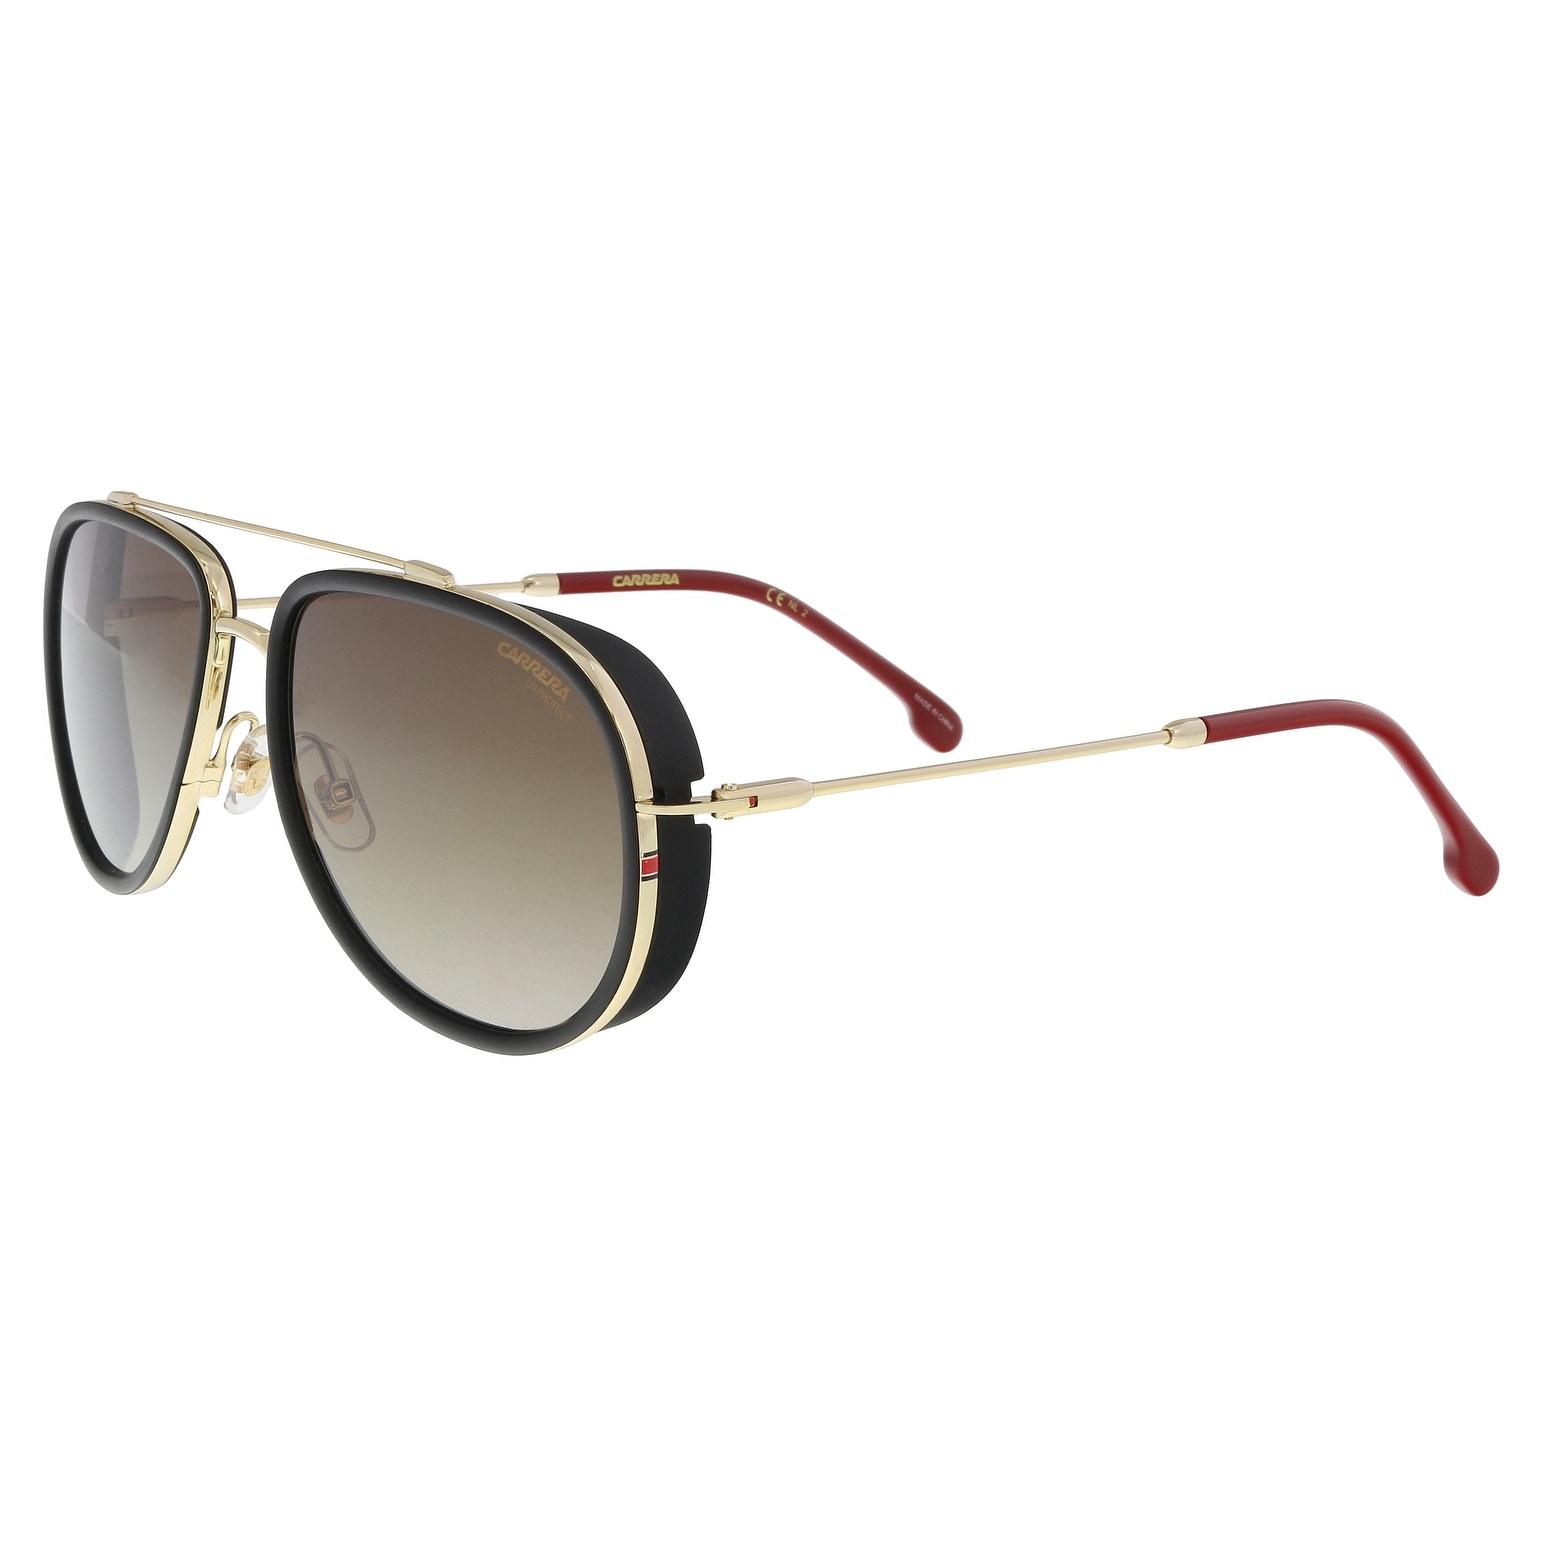 c525d0e55372f Shop Carrera CARRERA 166 S 0Y11-HA Black  Gold Aviator Sunglasses -  59-18-145 - Ships To Canada - Overstock - 21158016